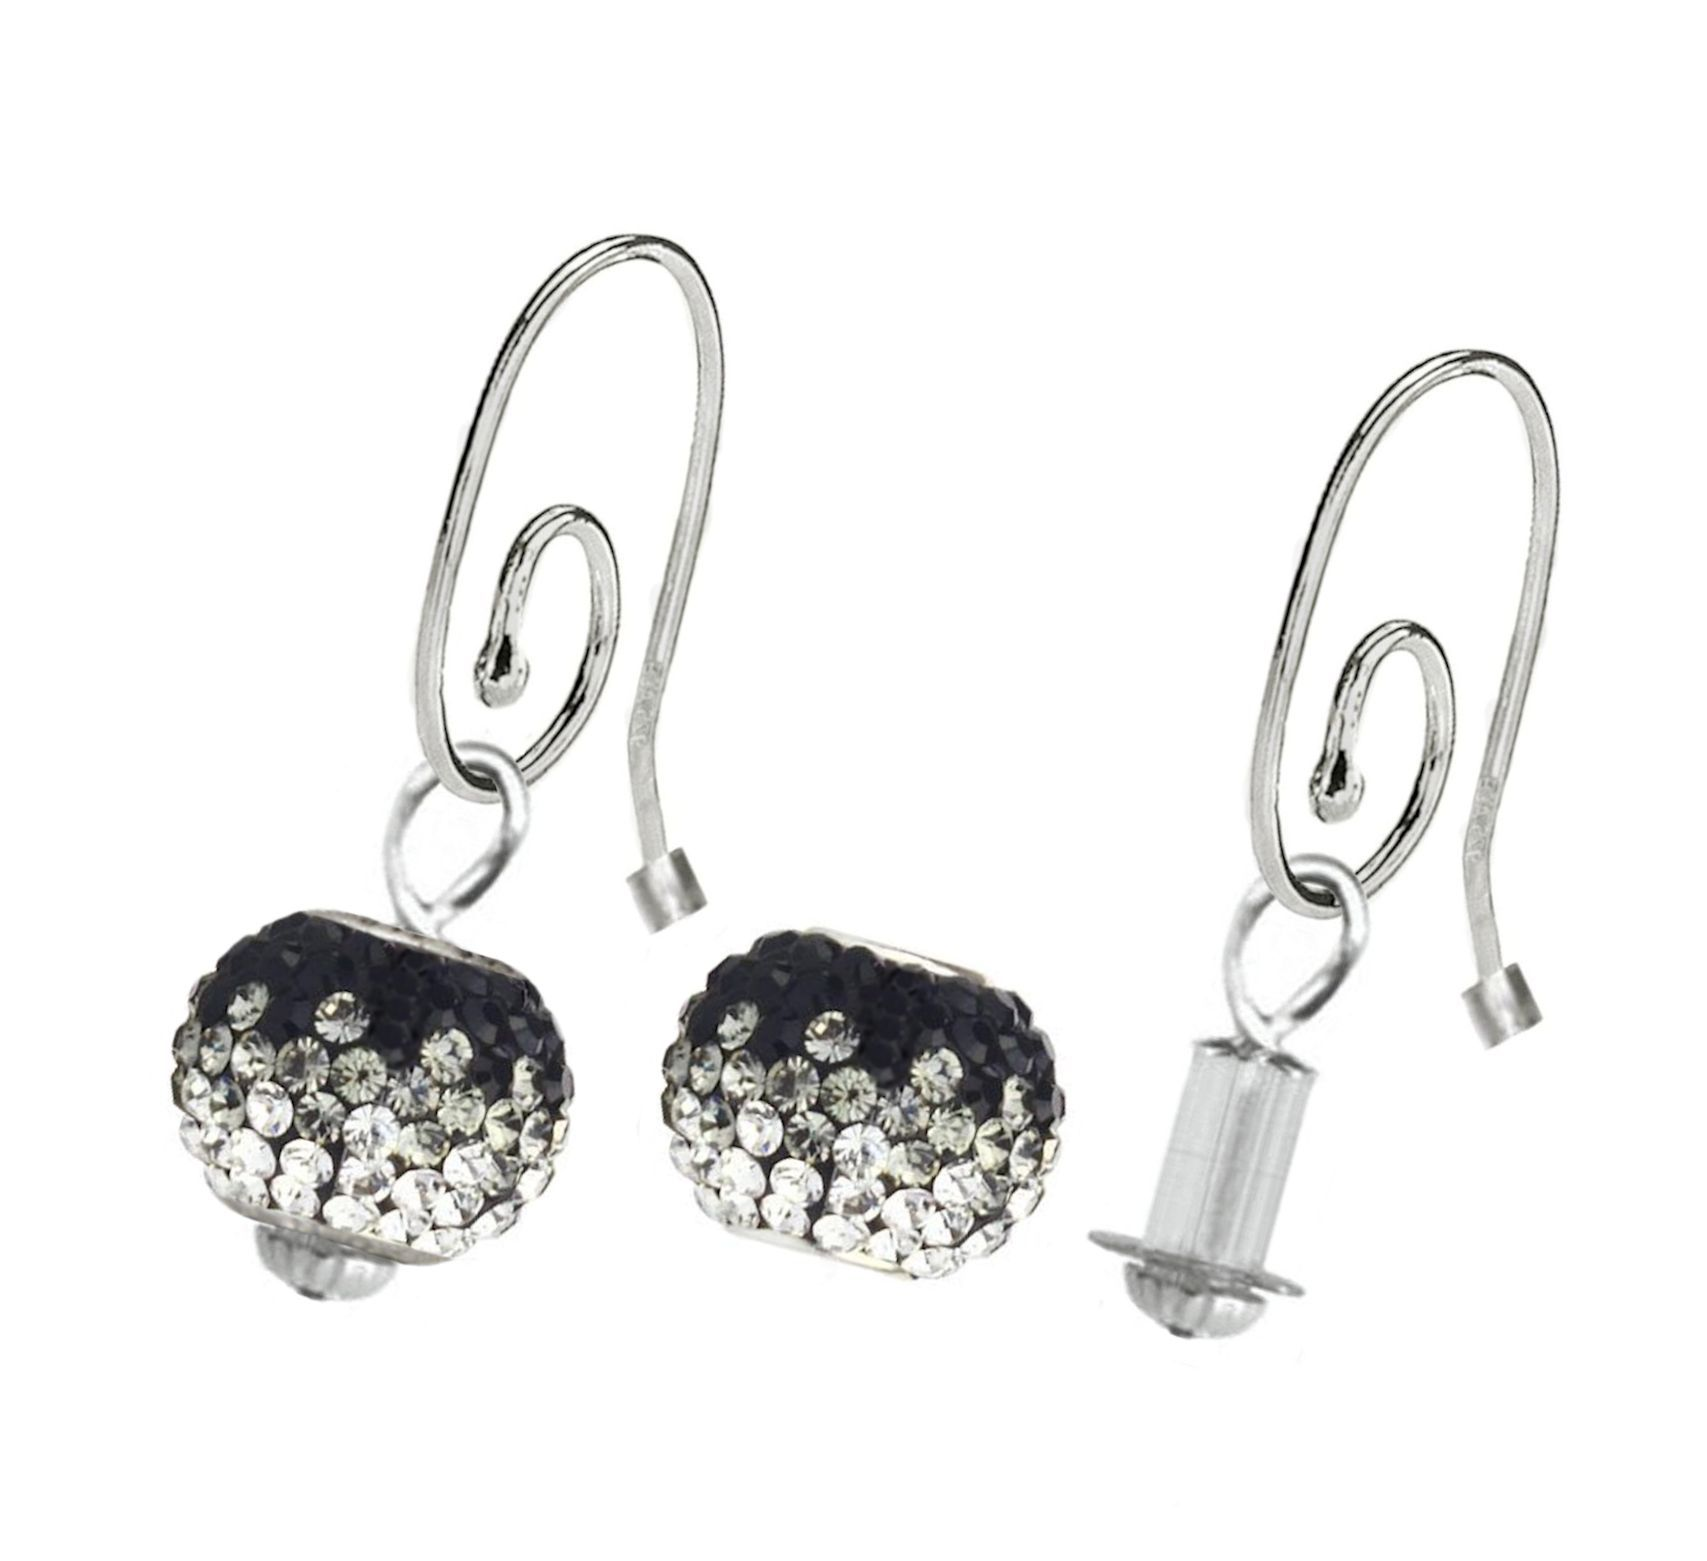 thetattedjewel4u eBay Pandora earrings, Beaded jewelry